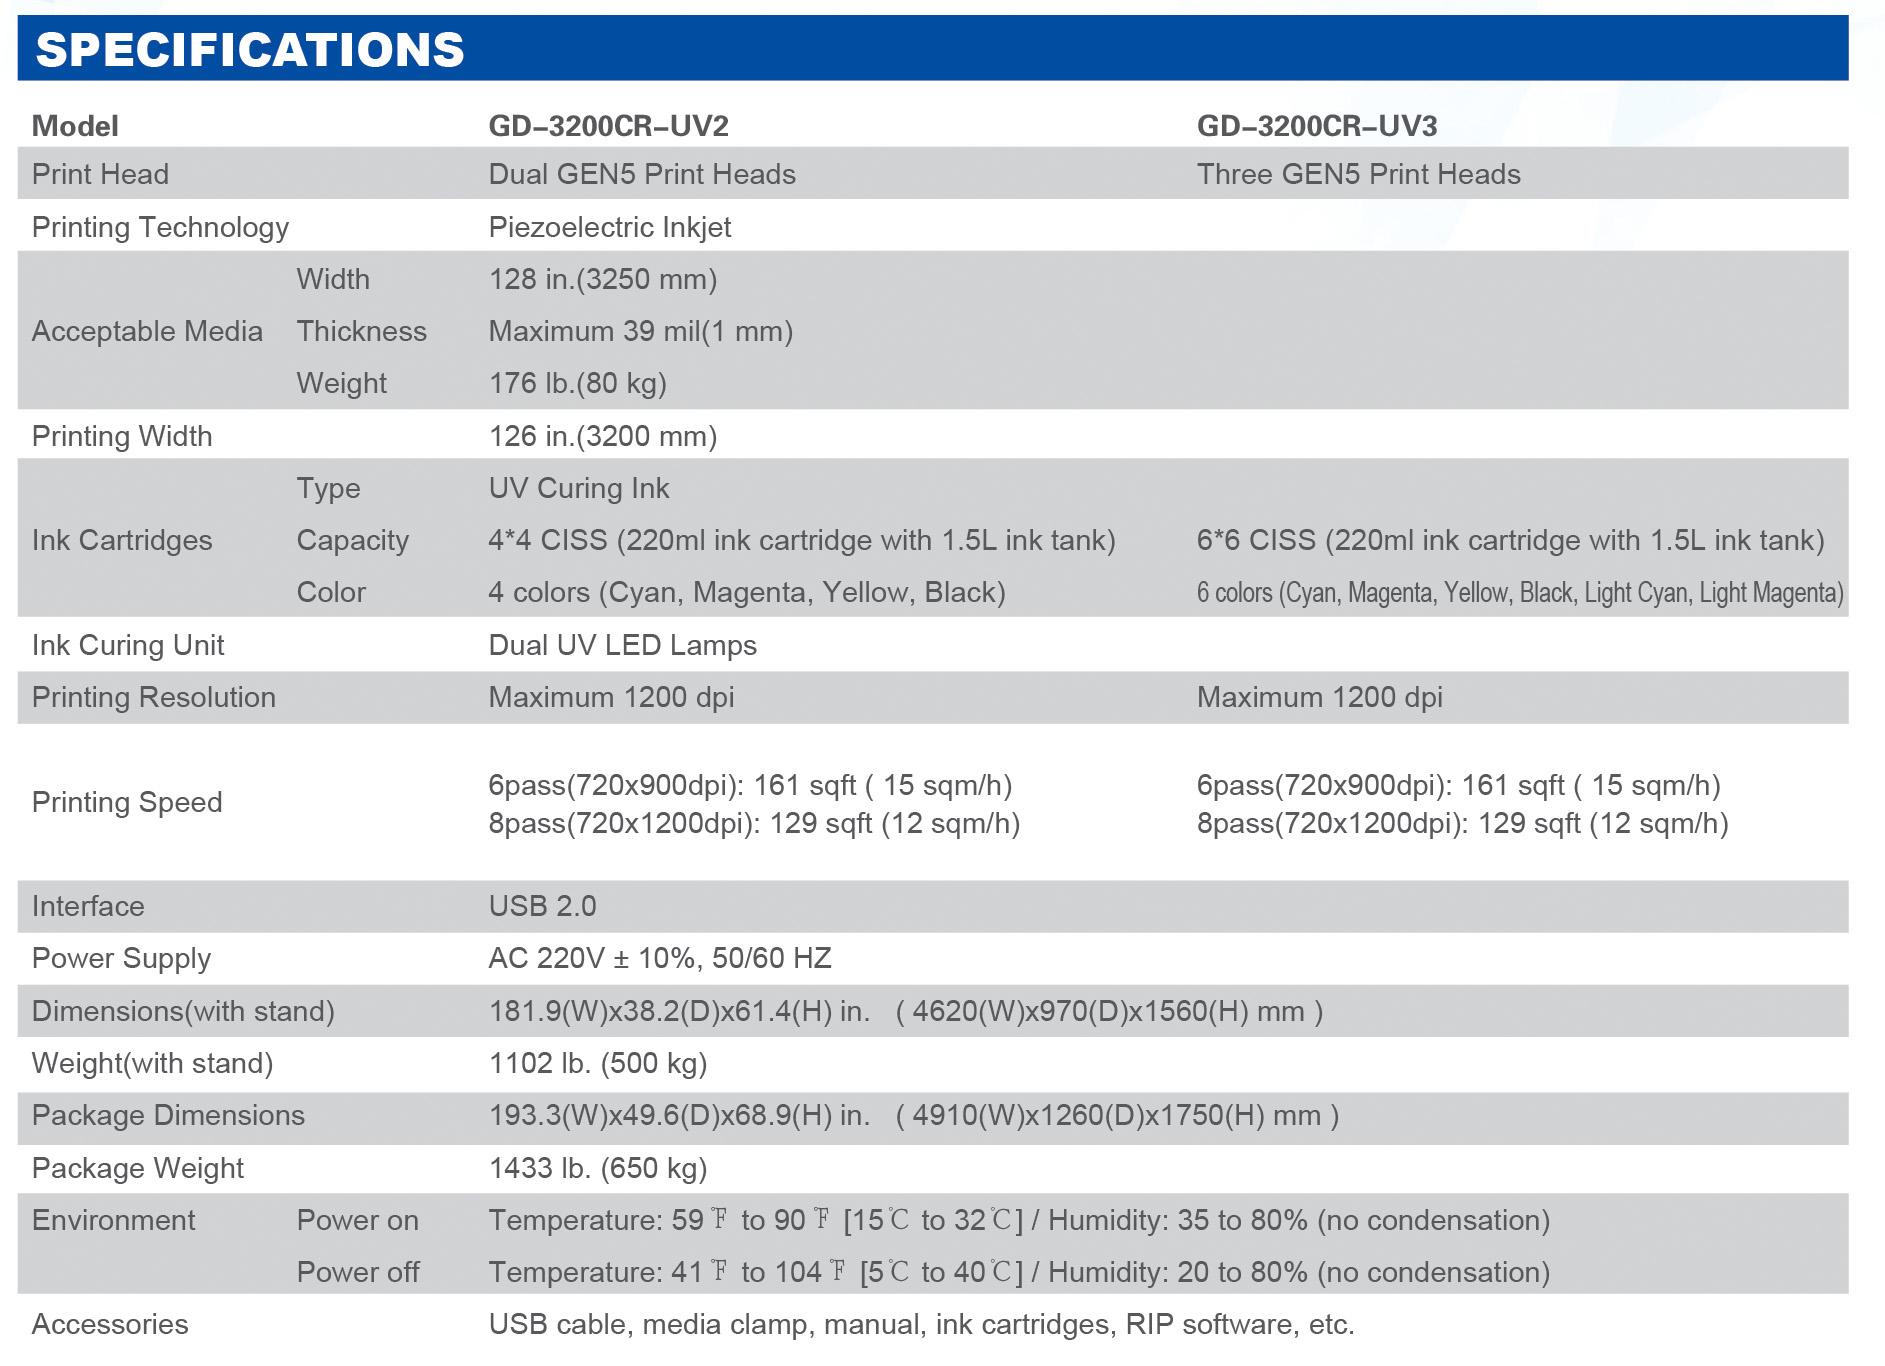 GD3200CR-UV 128'' UV Roll To Roll Printer With 4 Ricoh Gen5